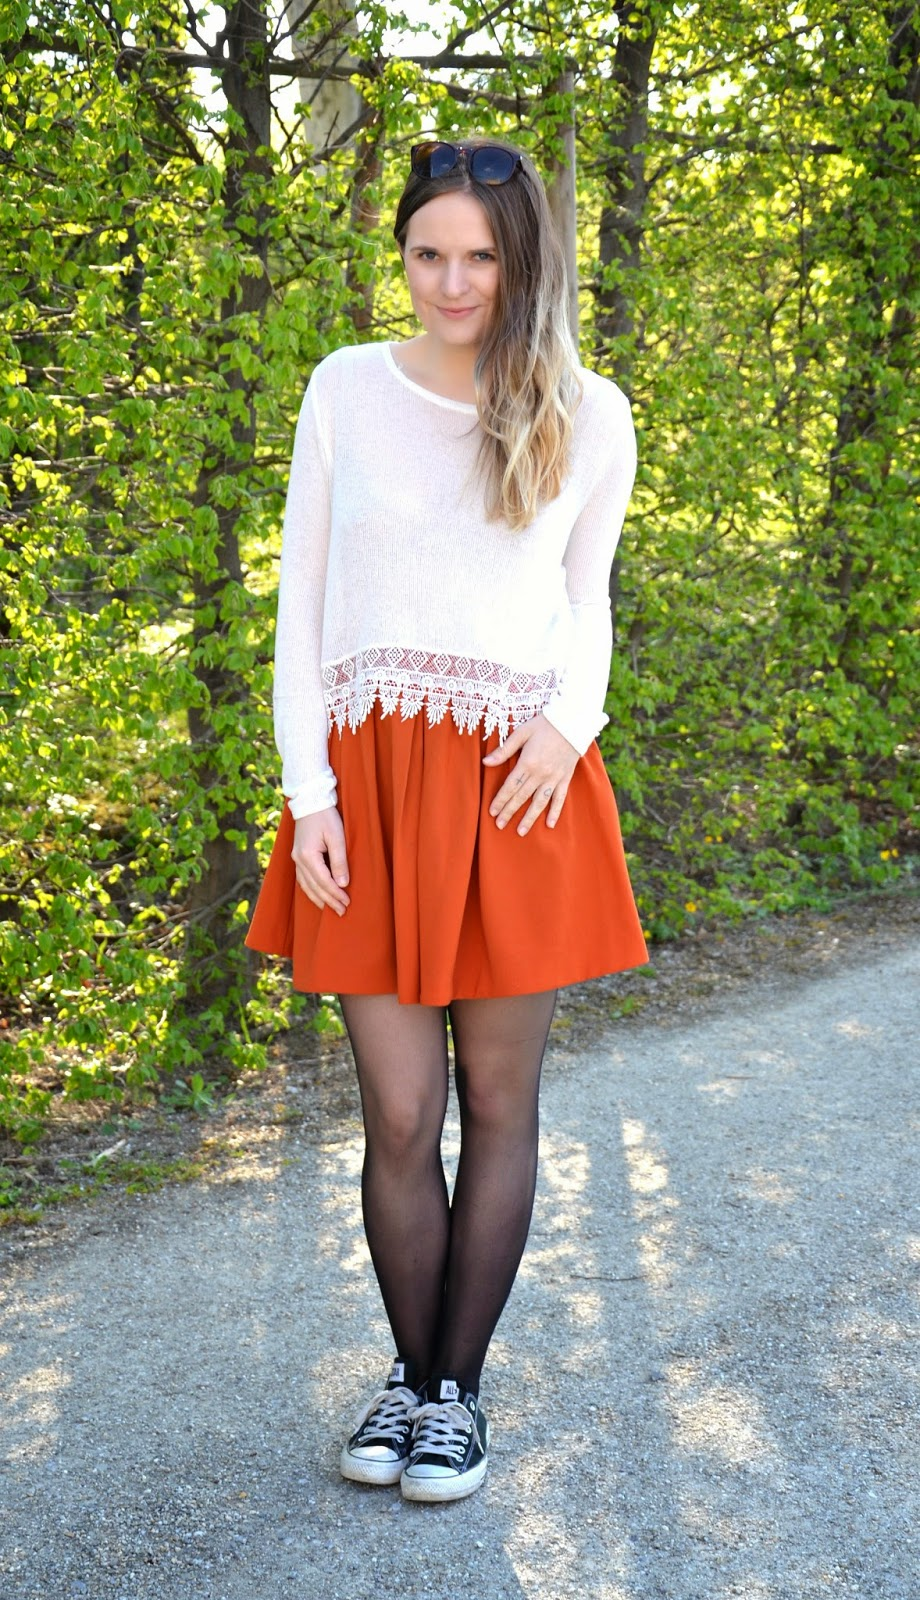 Stereotypically Me: Orange Skirt & Converse Chucks